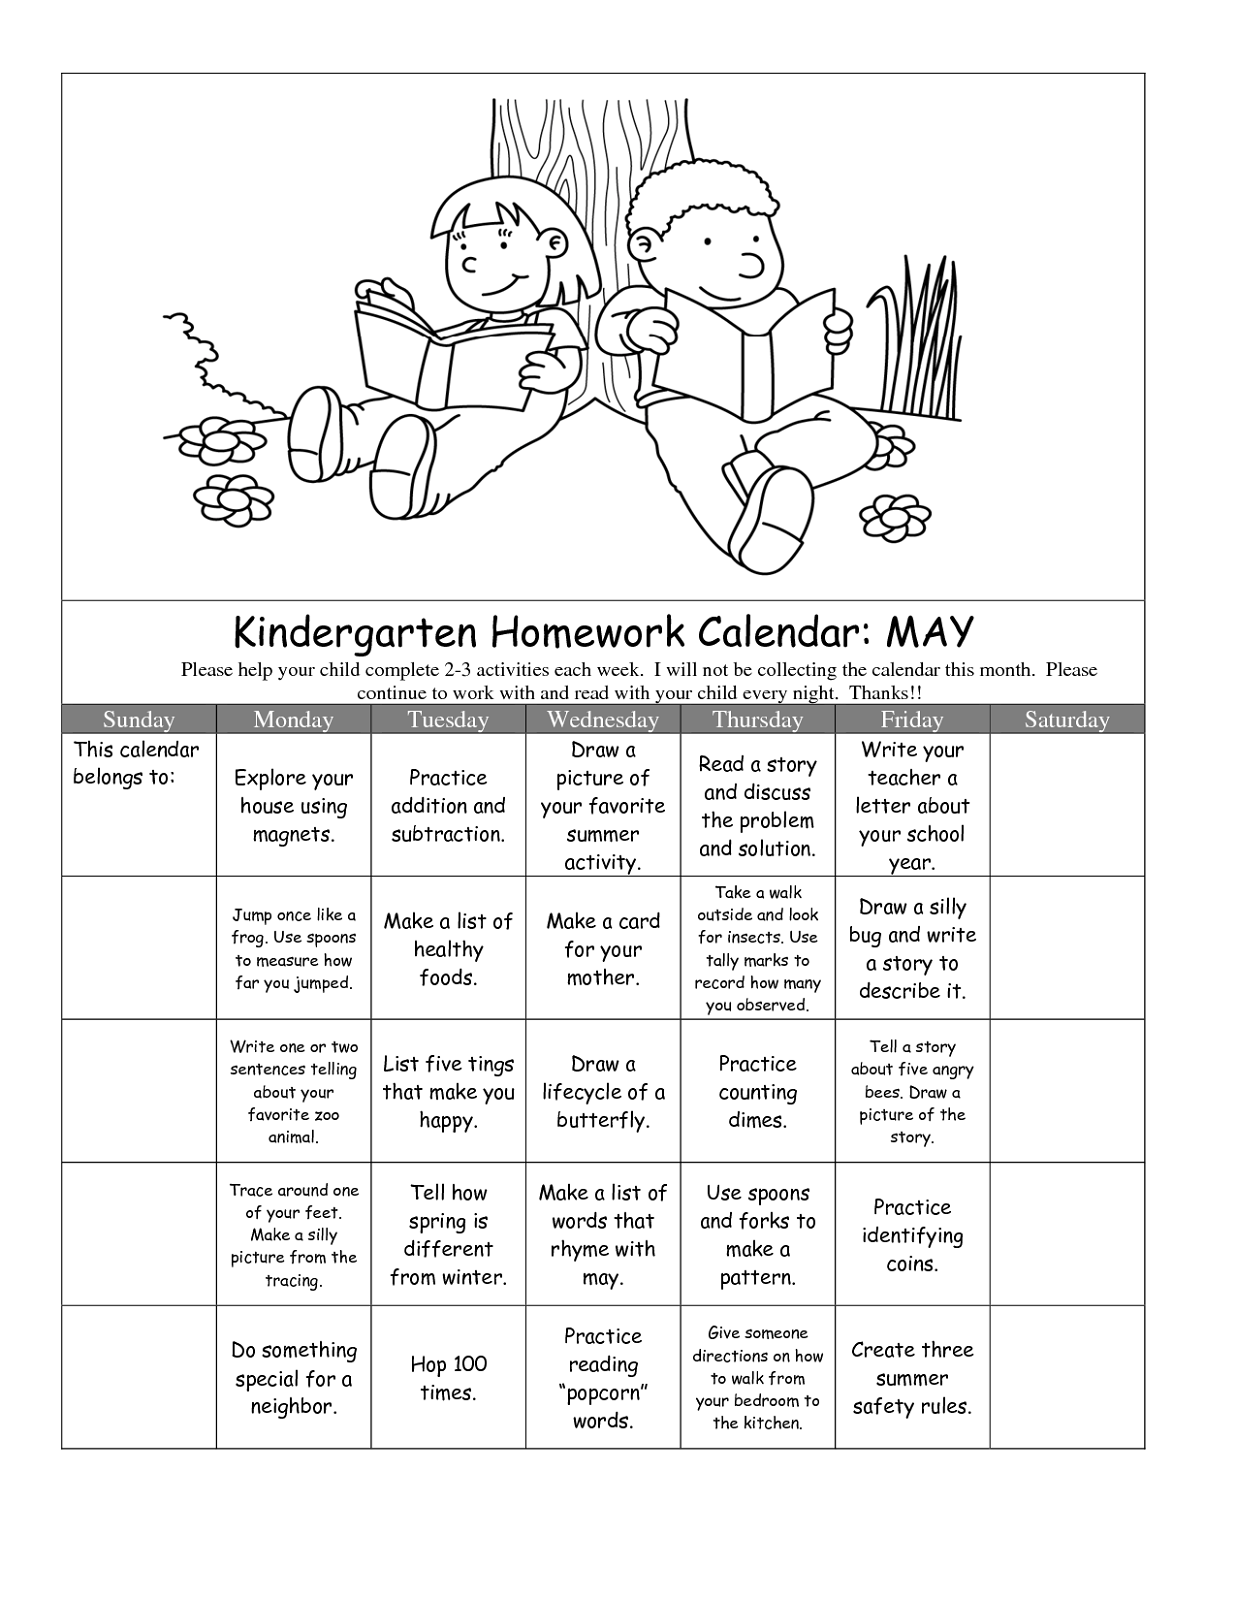 children's homework sheets 4